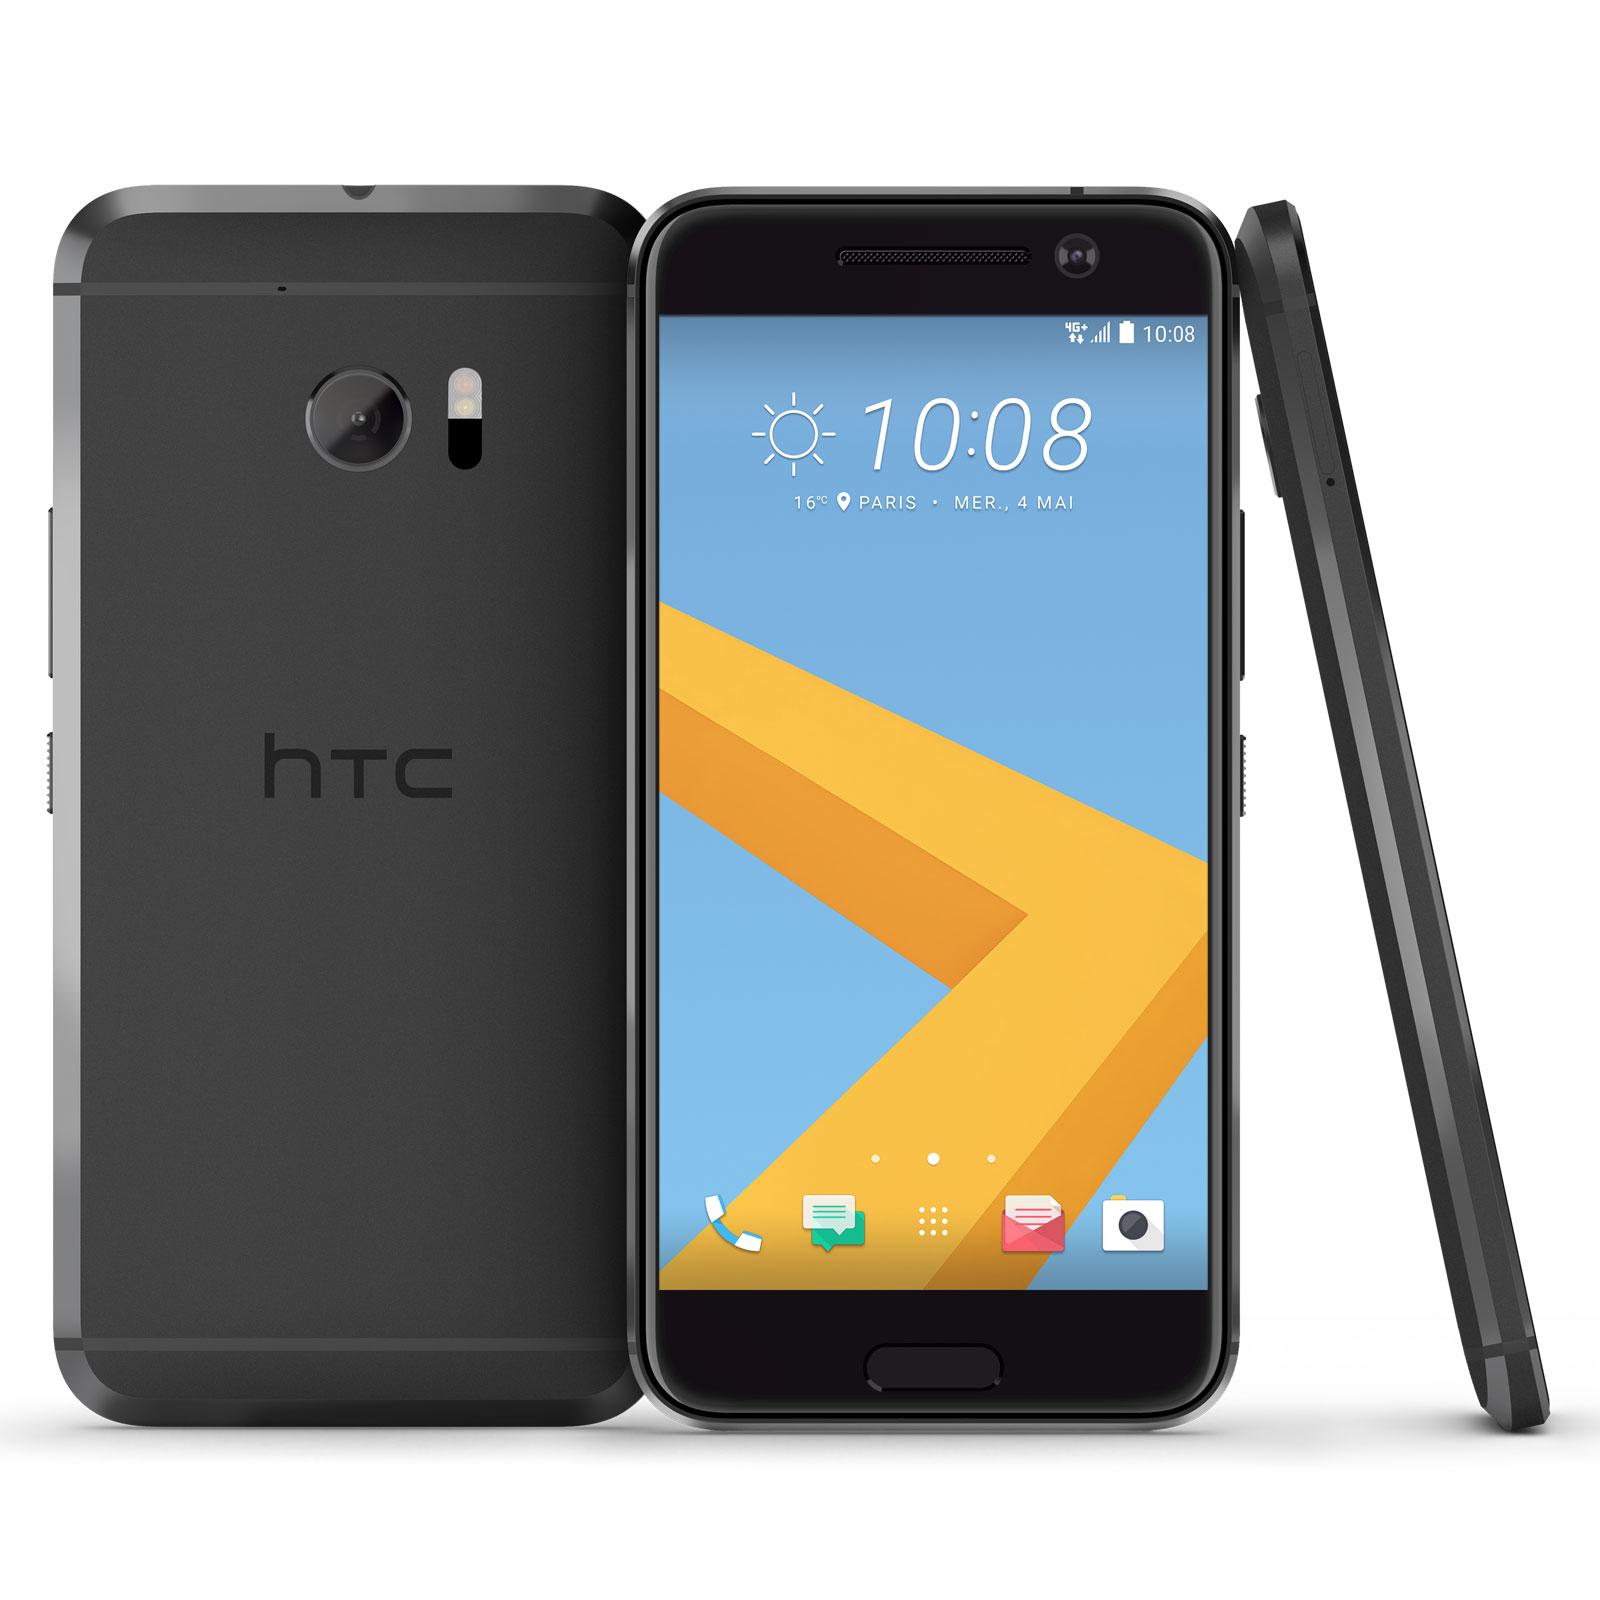 "Mobile & smartphone HTC 10 Carbone Smartphone 4G-LTE Advanced - Snapdragon 820 Quad-Core 2.2 Ghz - RAM 4 Go - Ecran tactile 5.2"" 1440 x 2560 - 32 Go - NFC/Bluetooth 4.2 - 3000 mAh - Android 6.0"